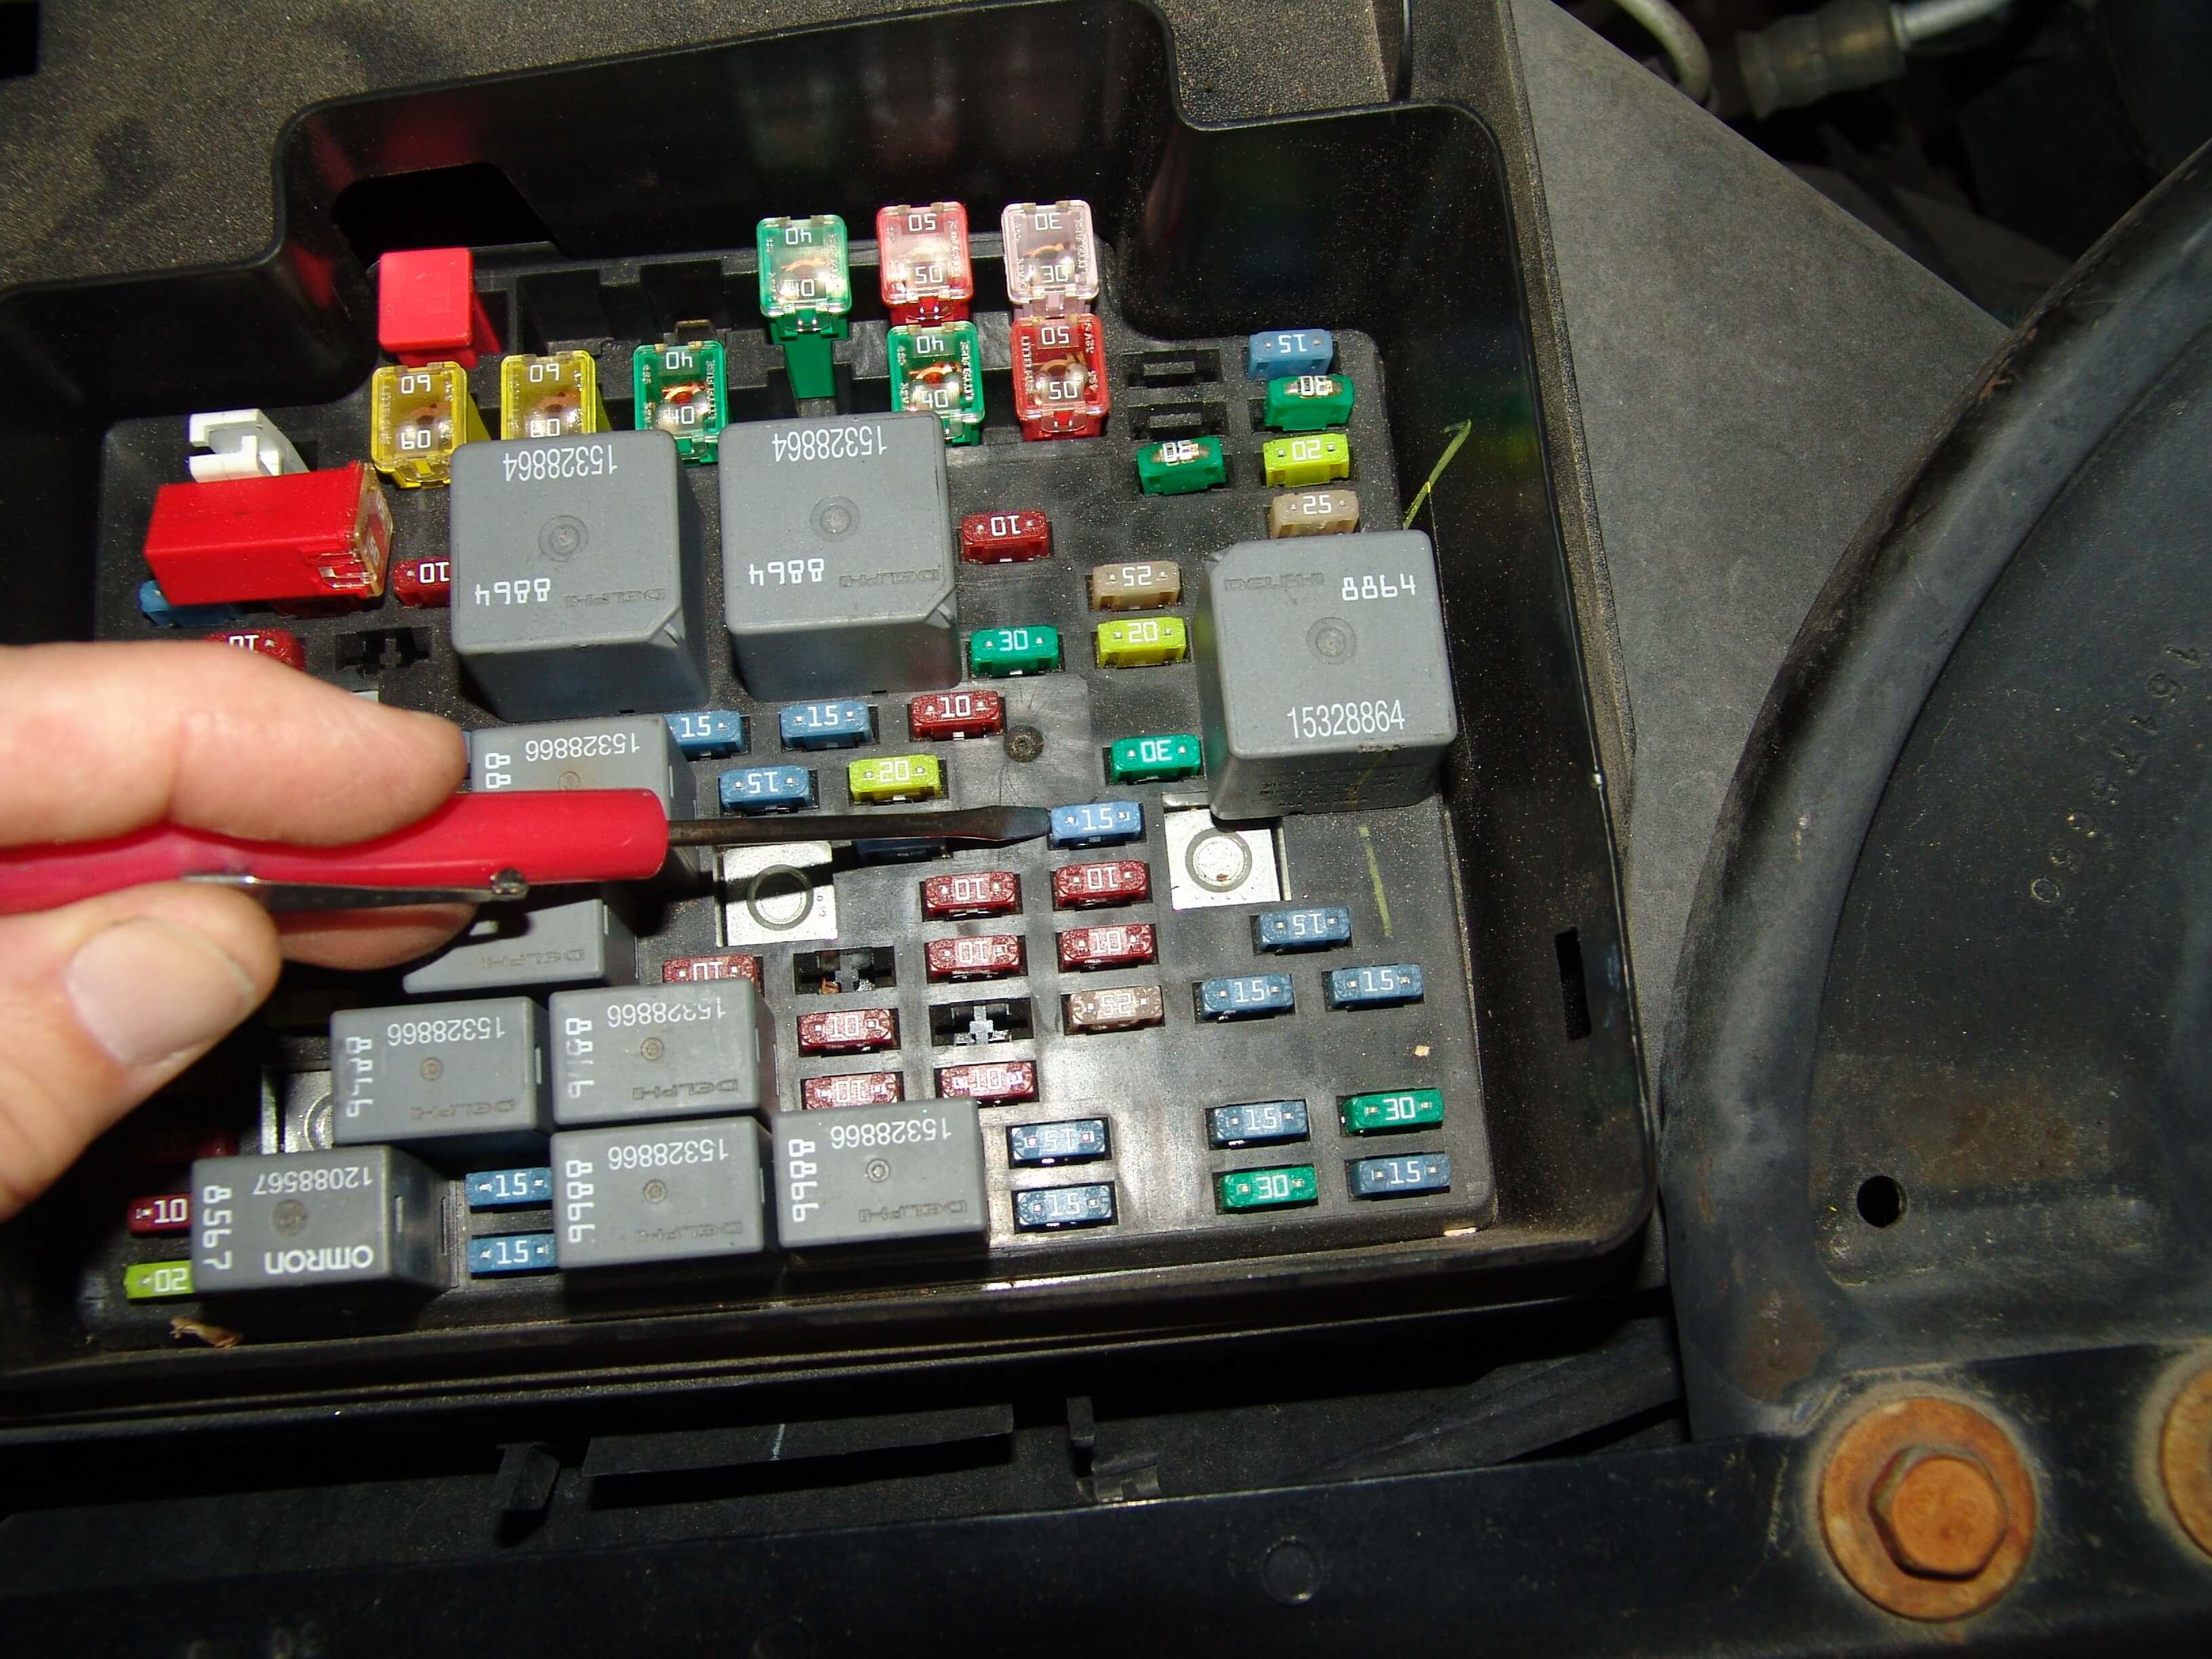 2003 Silverado Airbag Fuse Box Electrical Wiring Diagrams 2009 Diagram Electricity Basics 101 U2022 Heater Relay